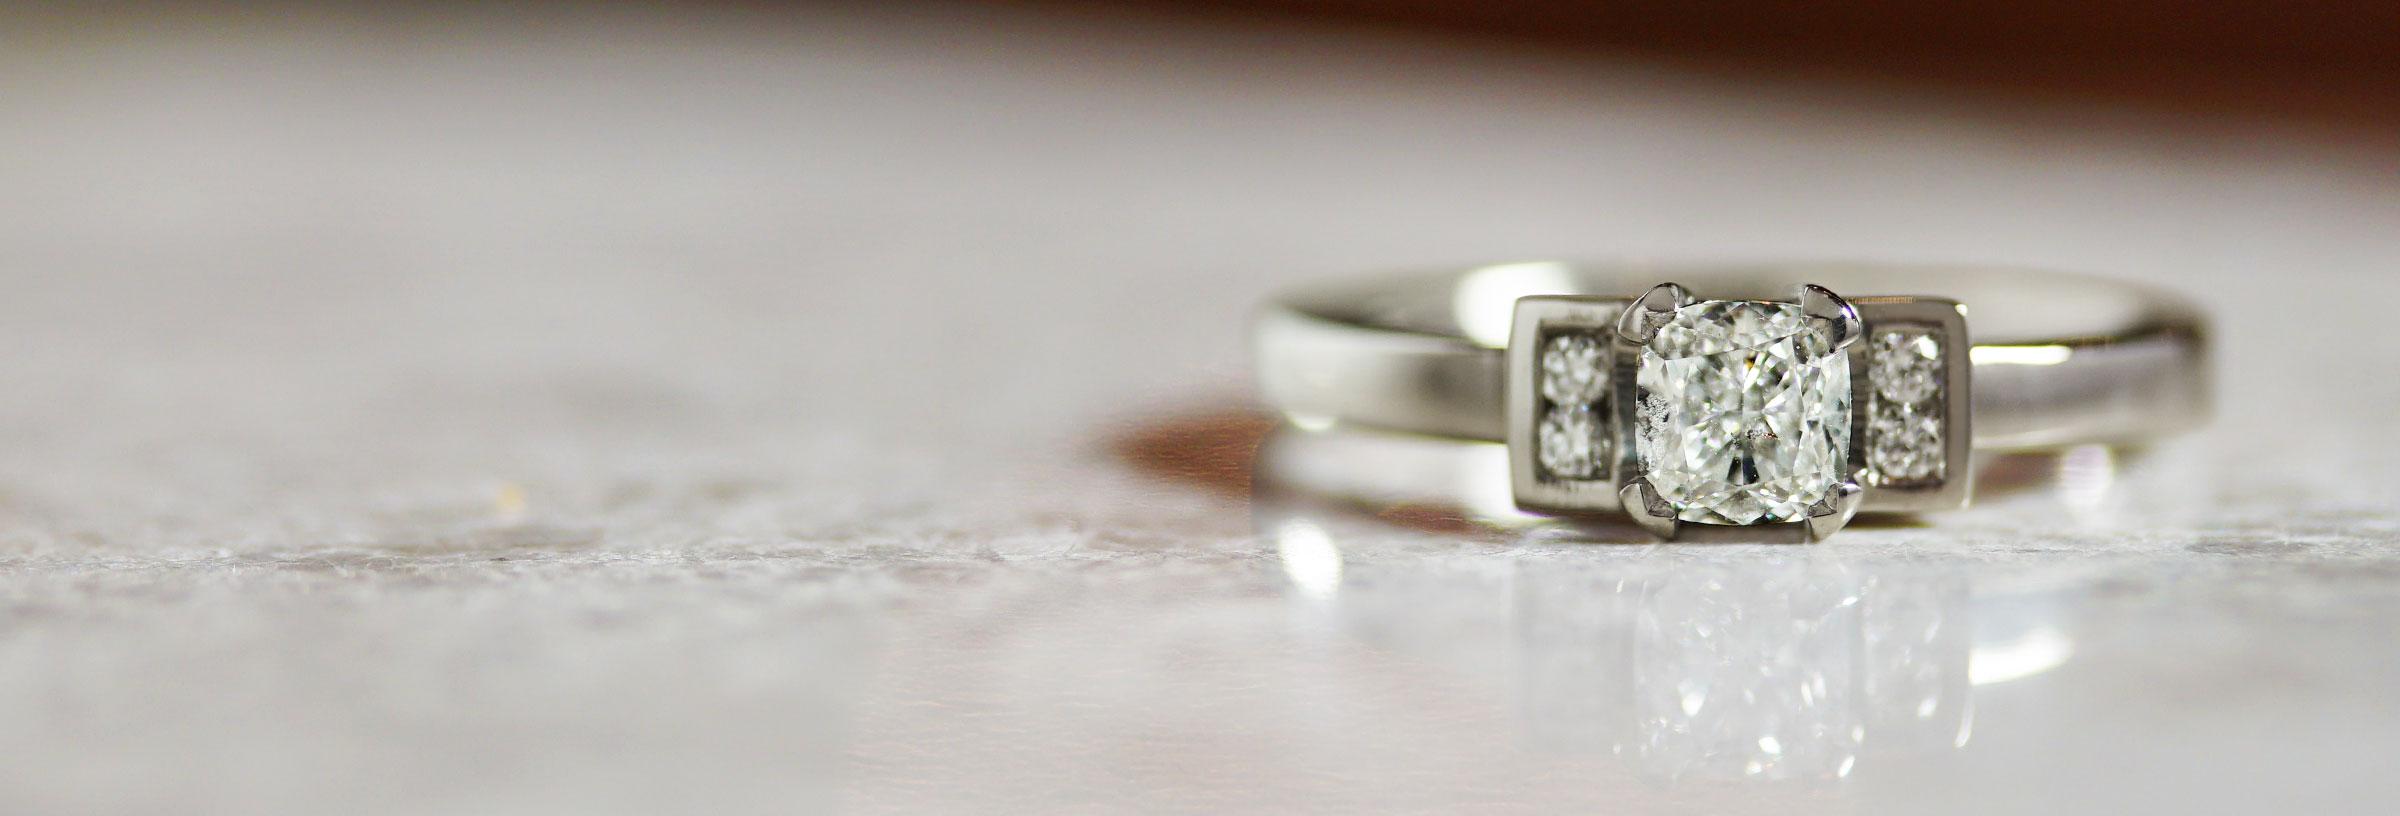 cushion-cut-diamond-and-palladium-five-stone-engagement-ring